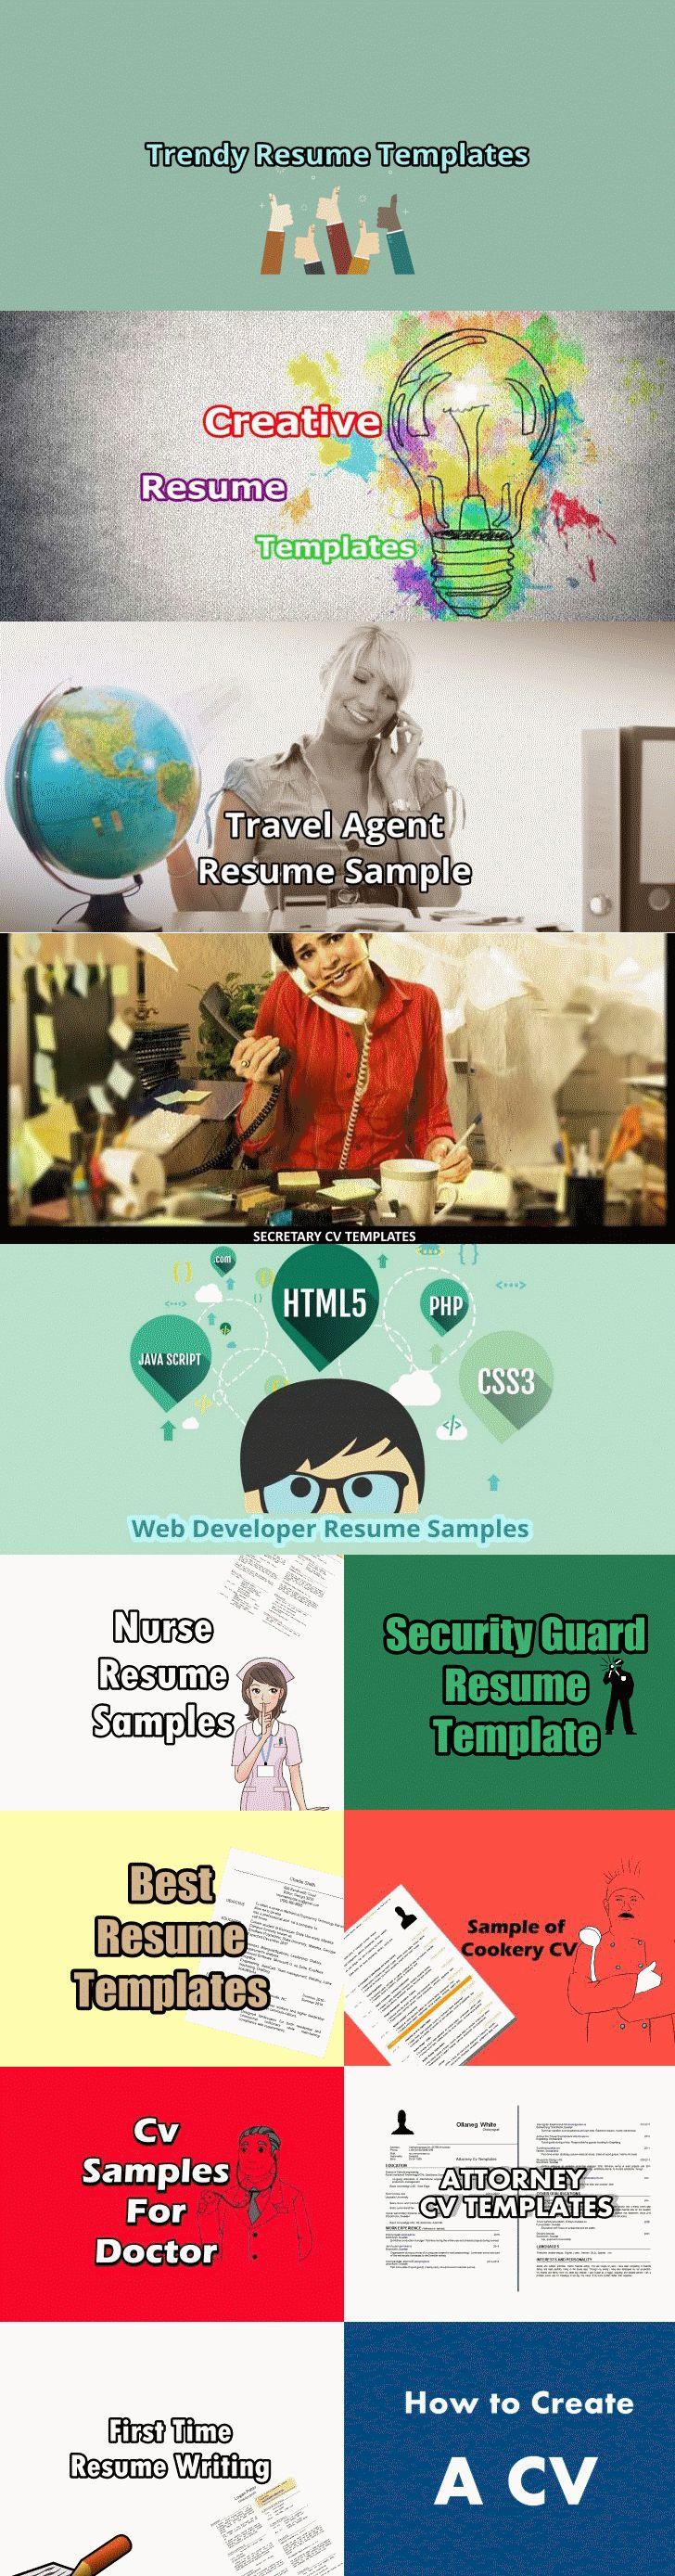 Resume templates free resume templates resume examples